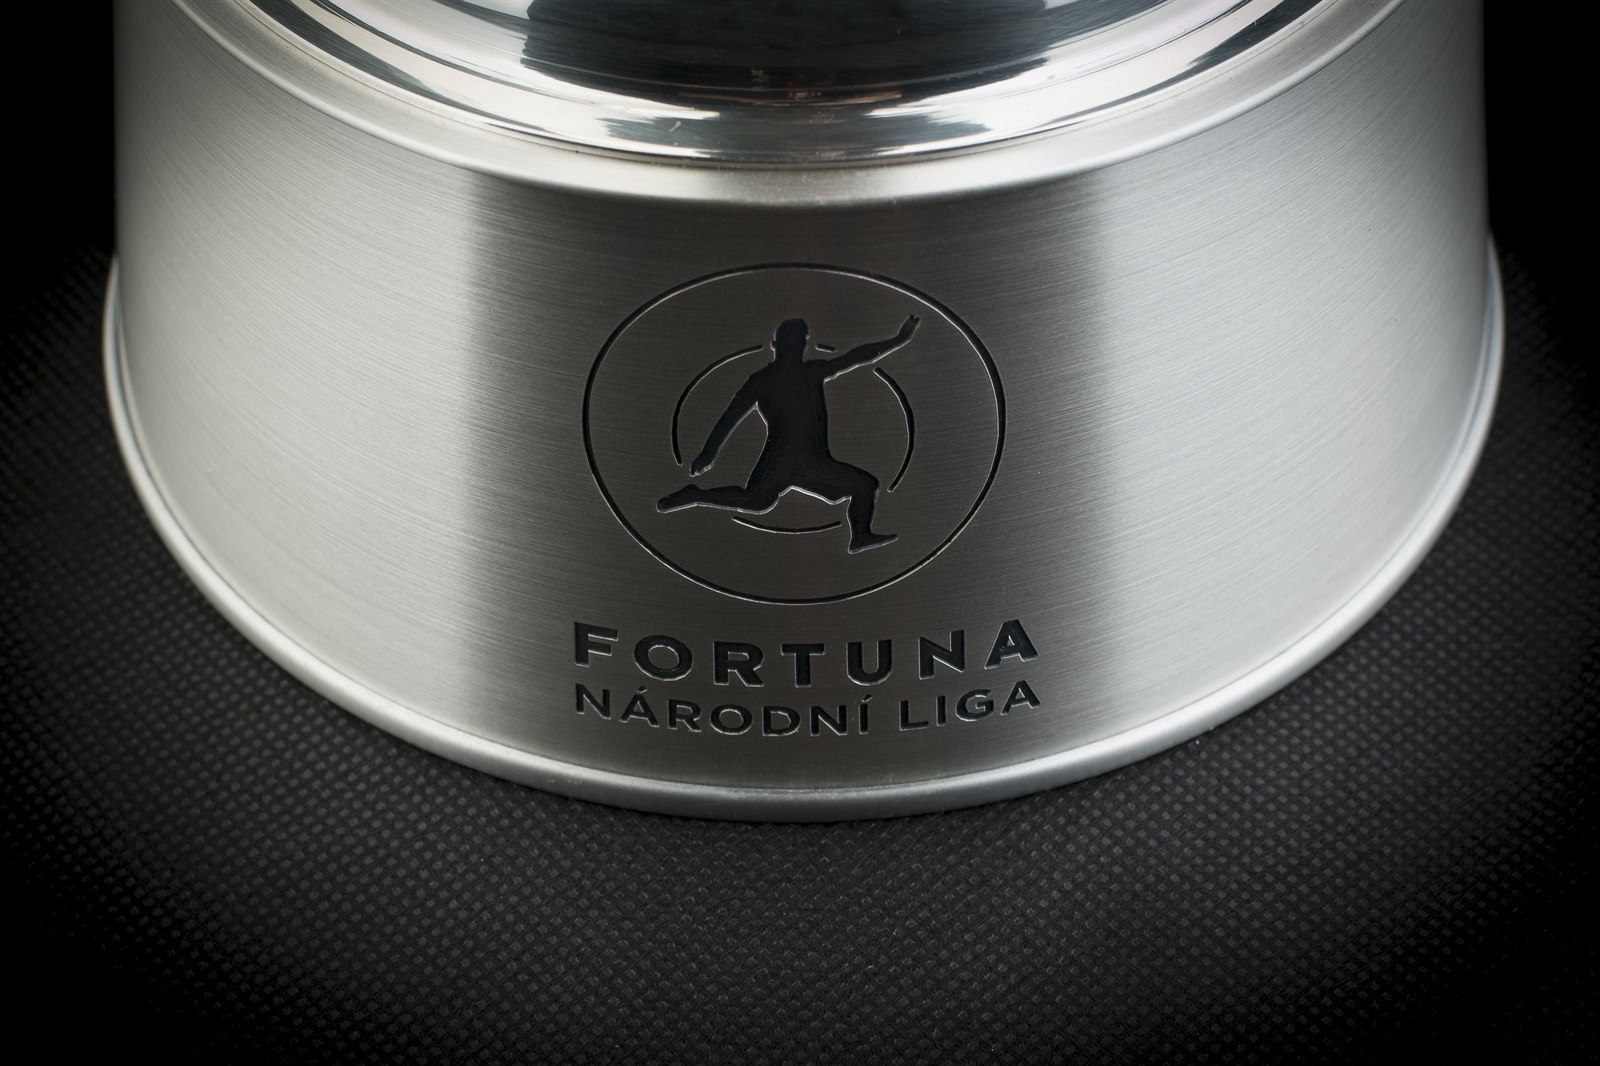 Fortuna národní liga